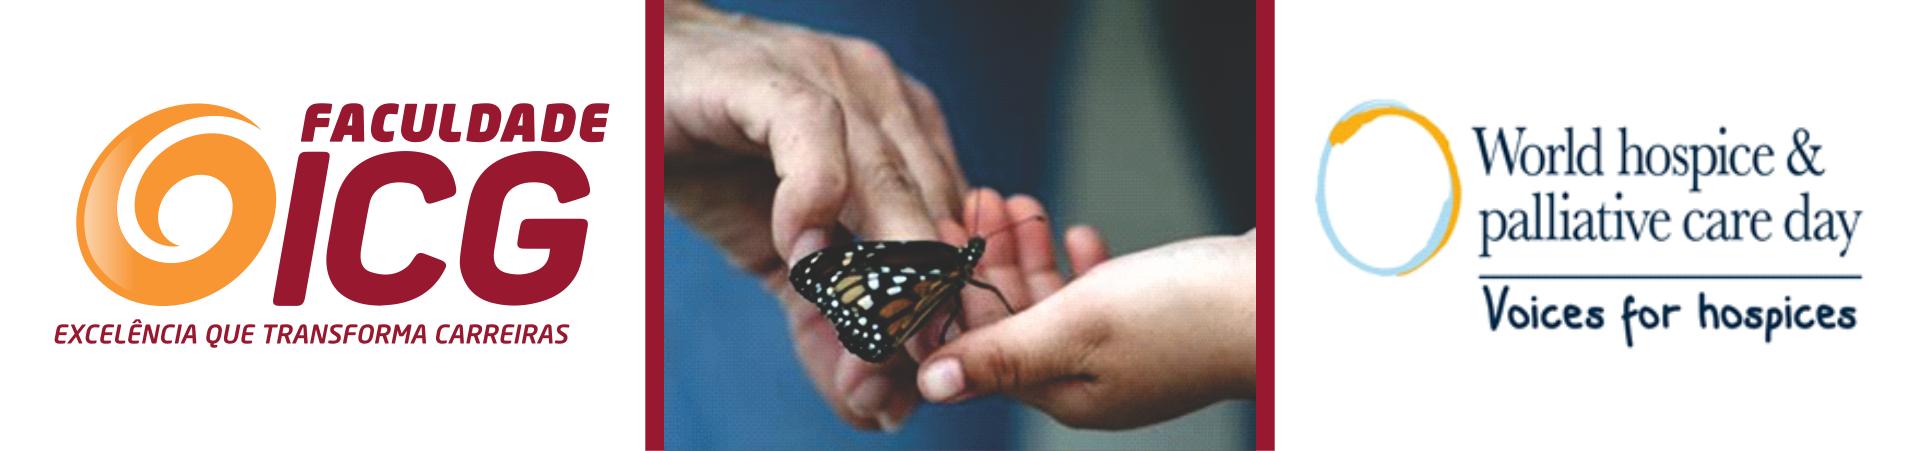 dia mundial cuidados paleativos